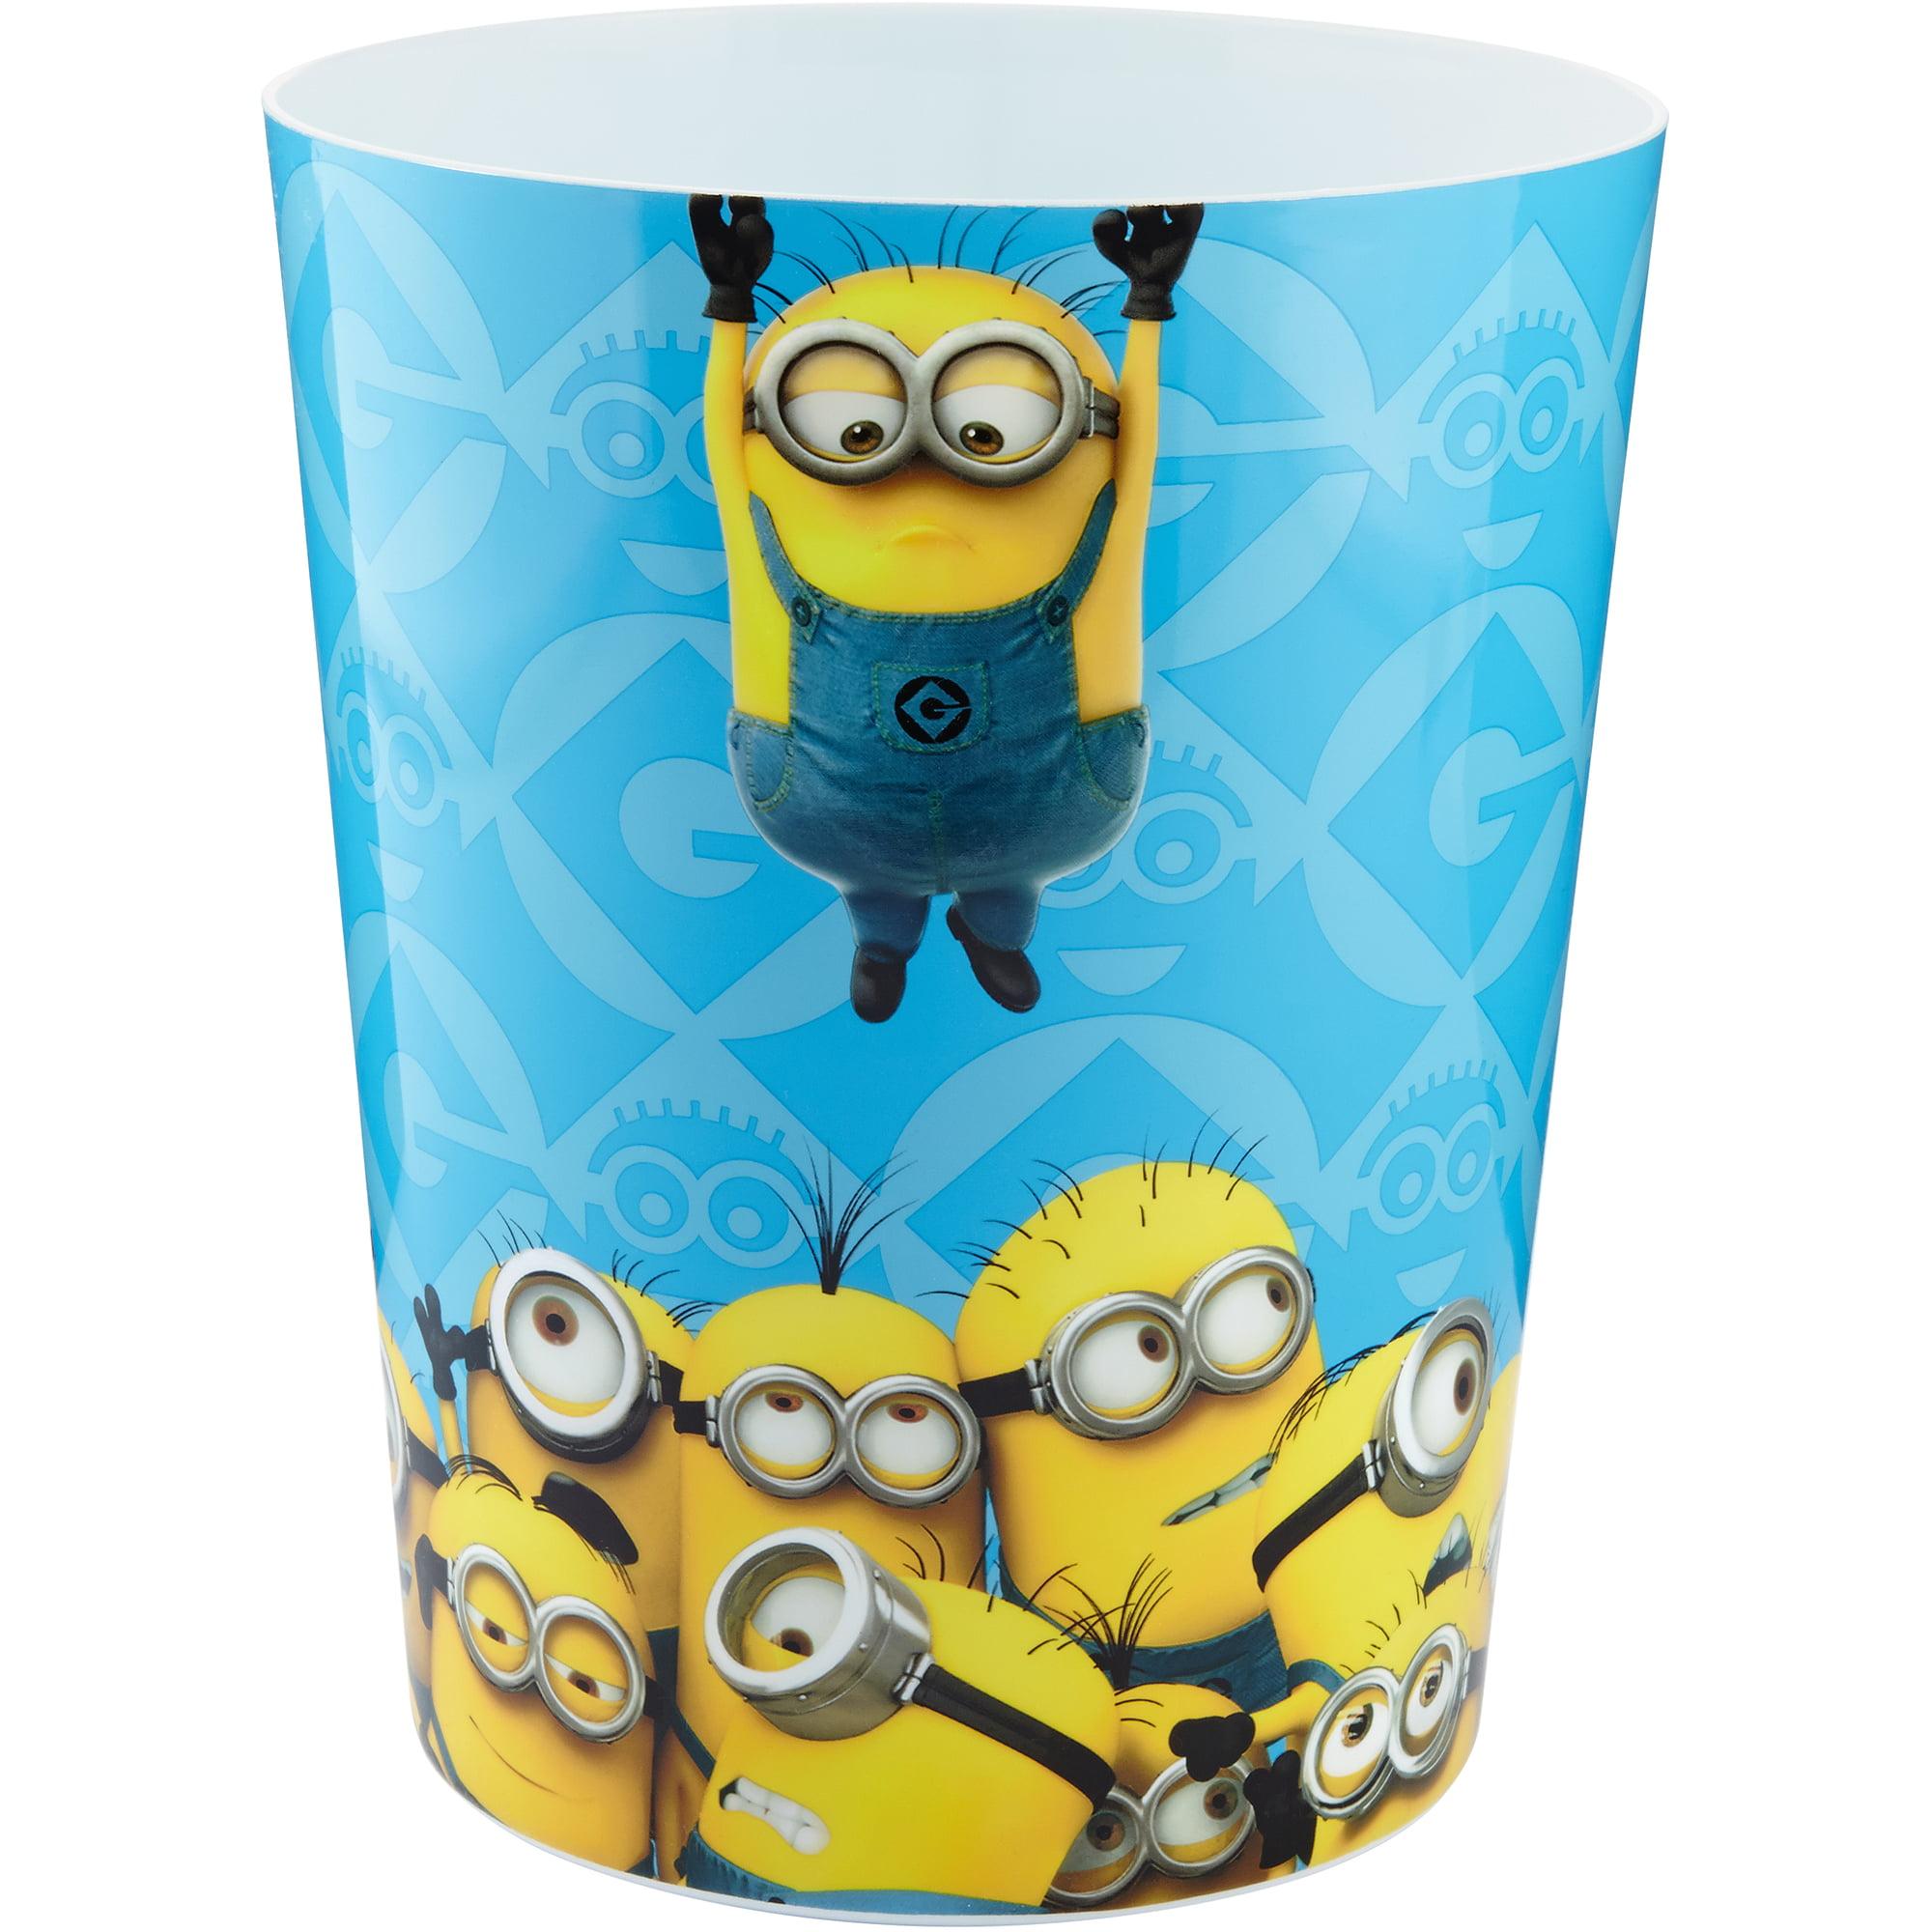 Universal's Minions Waste Basket